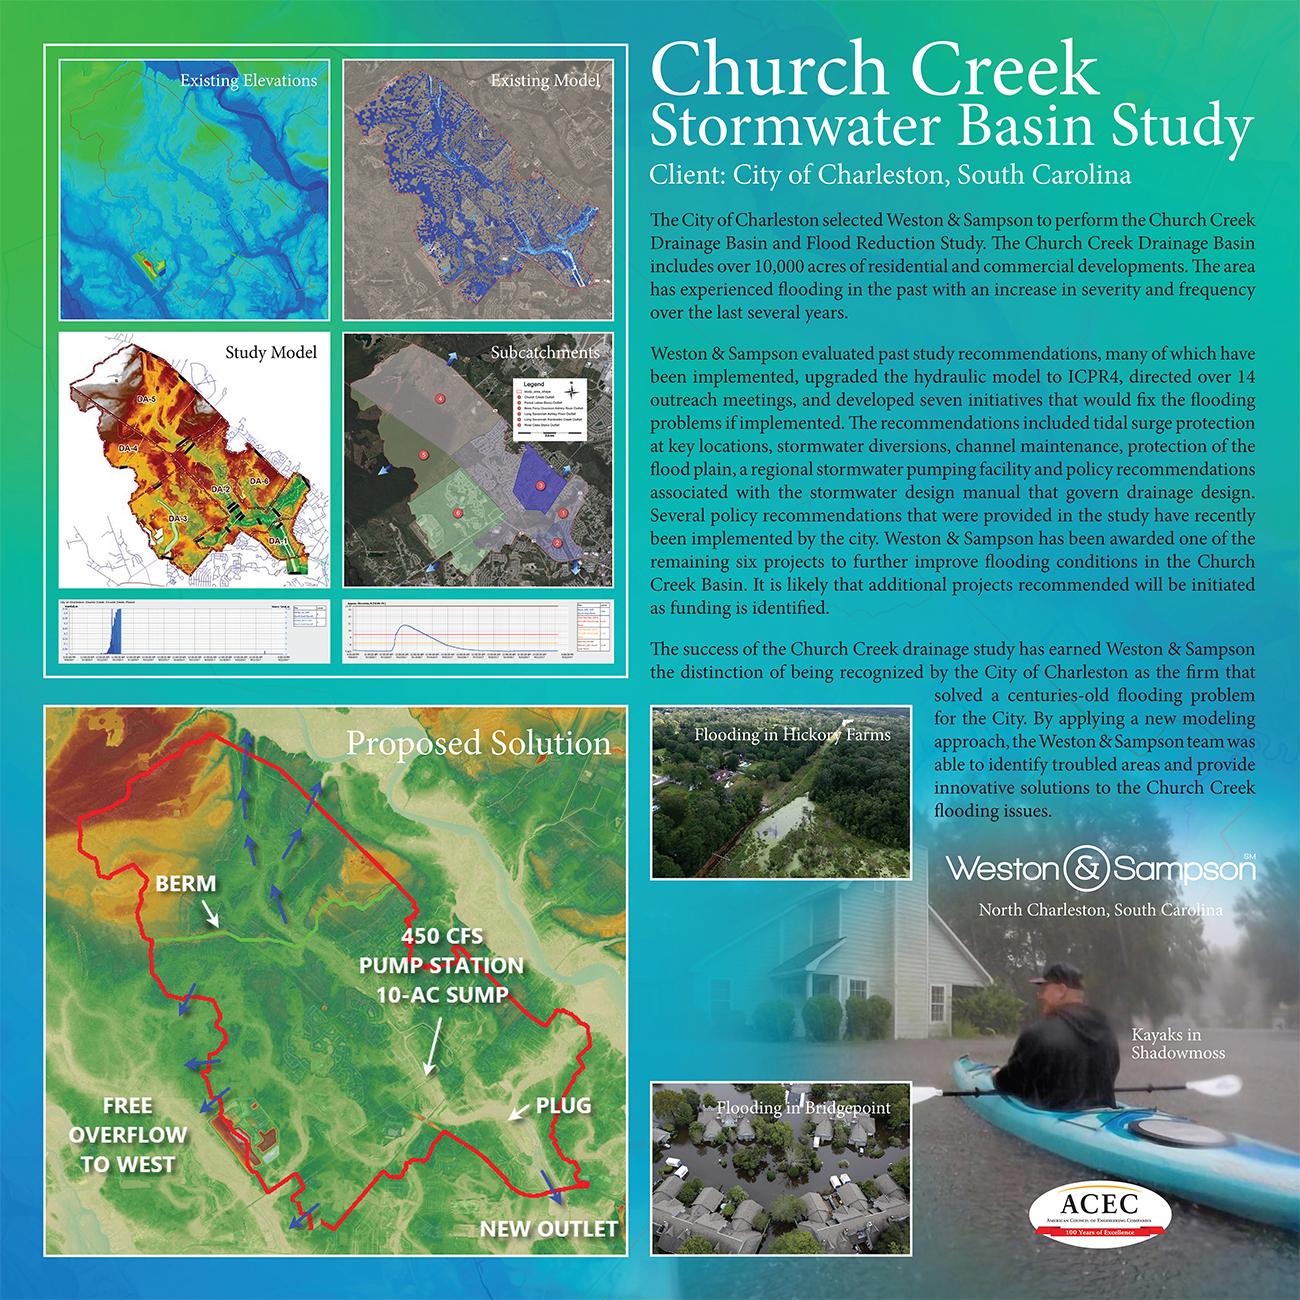 Church Creek Stormwater Basin Study